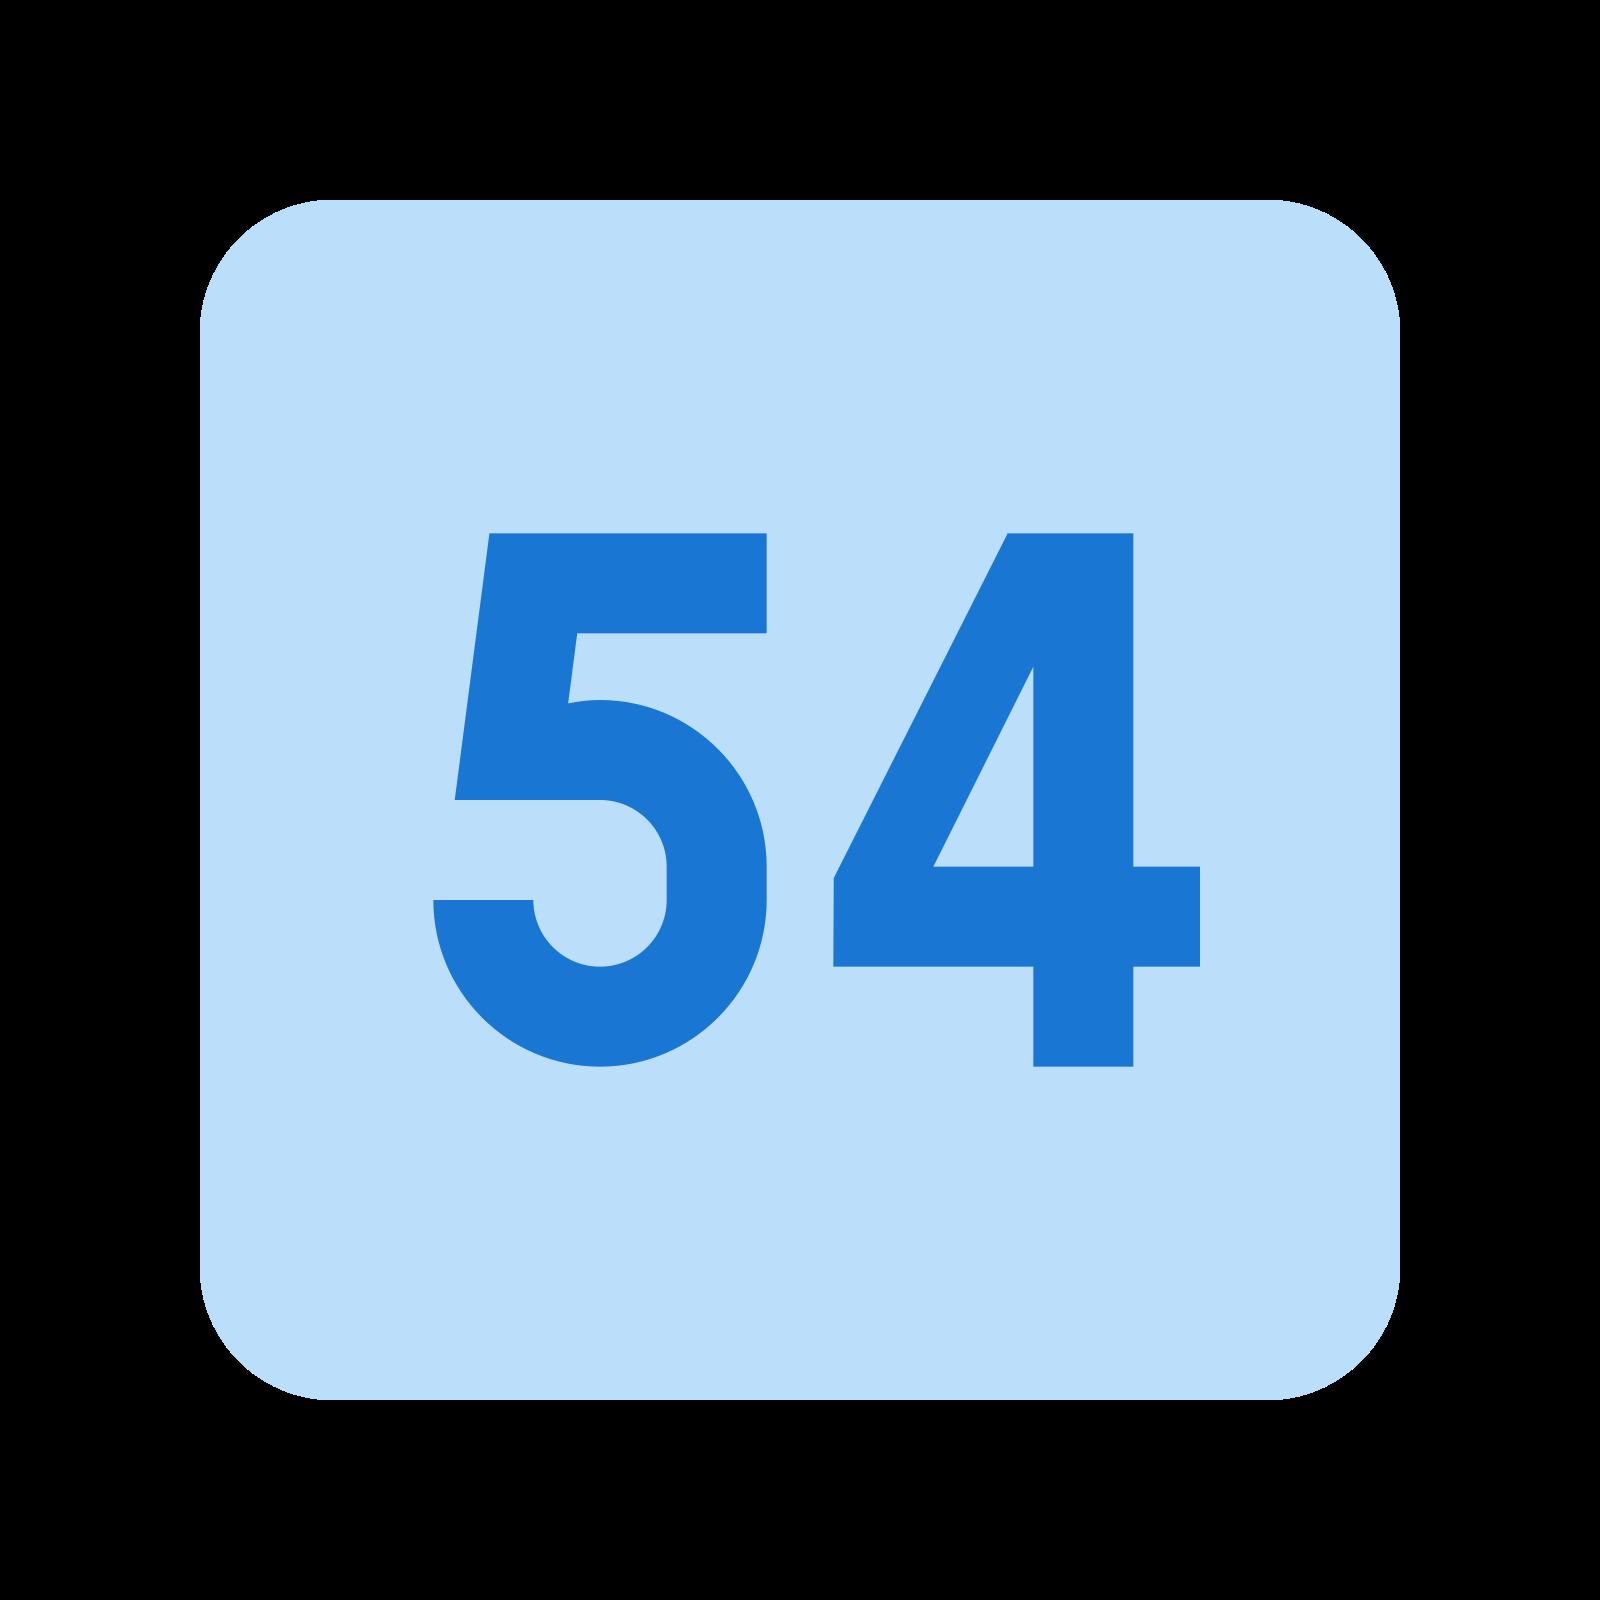 54 icon